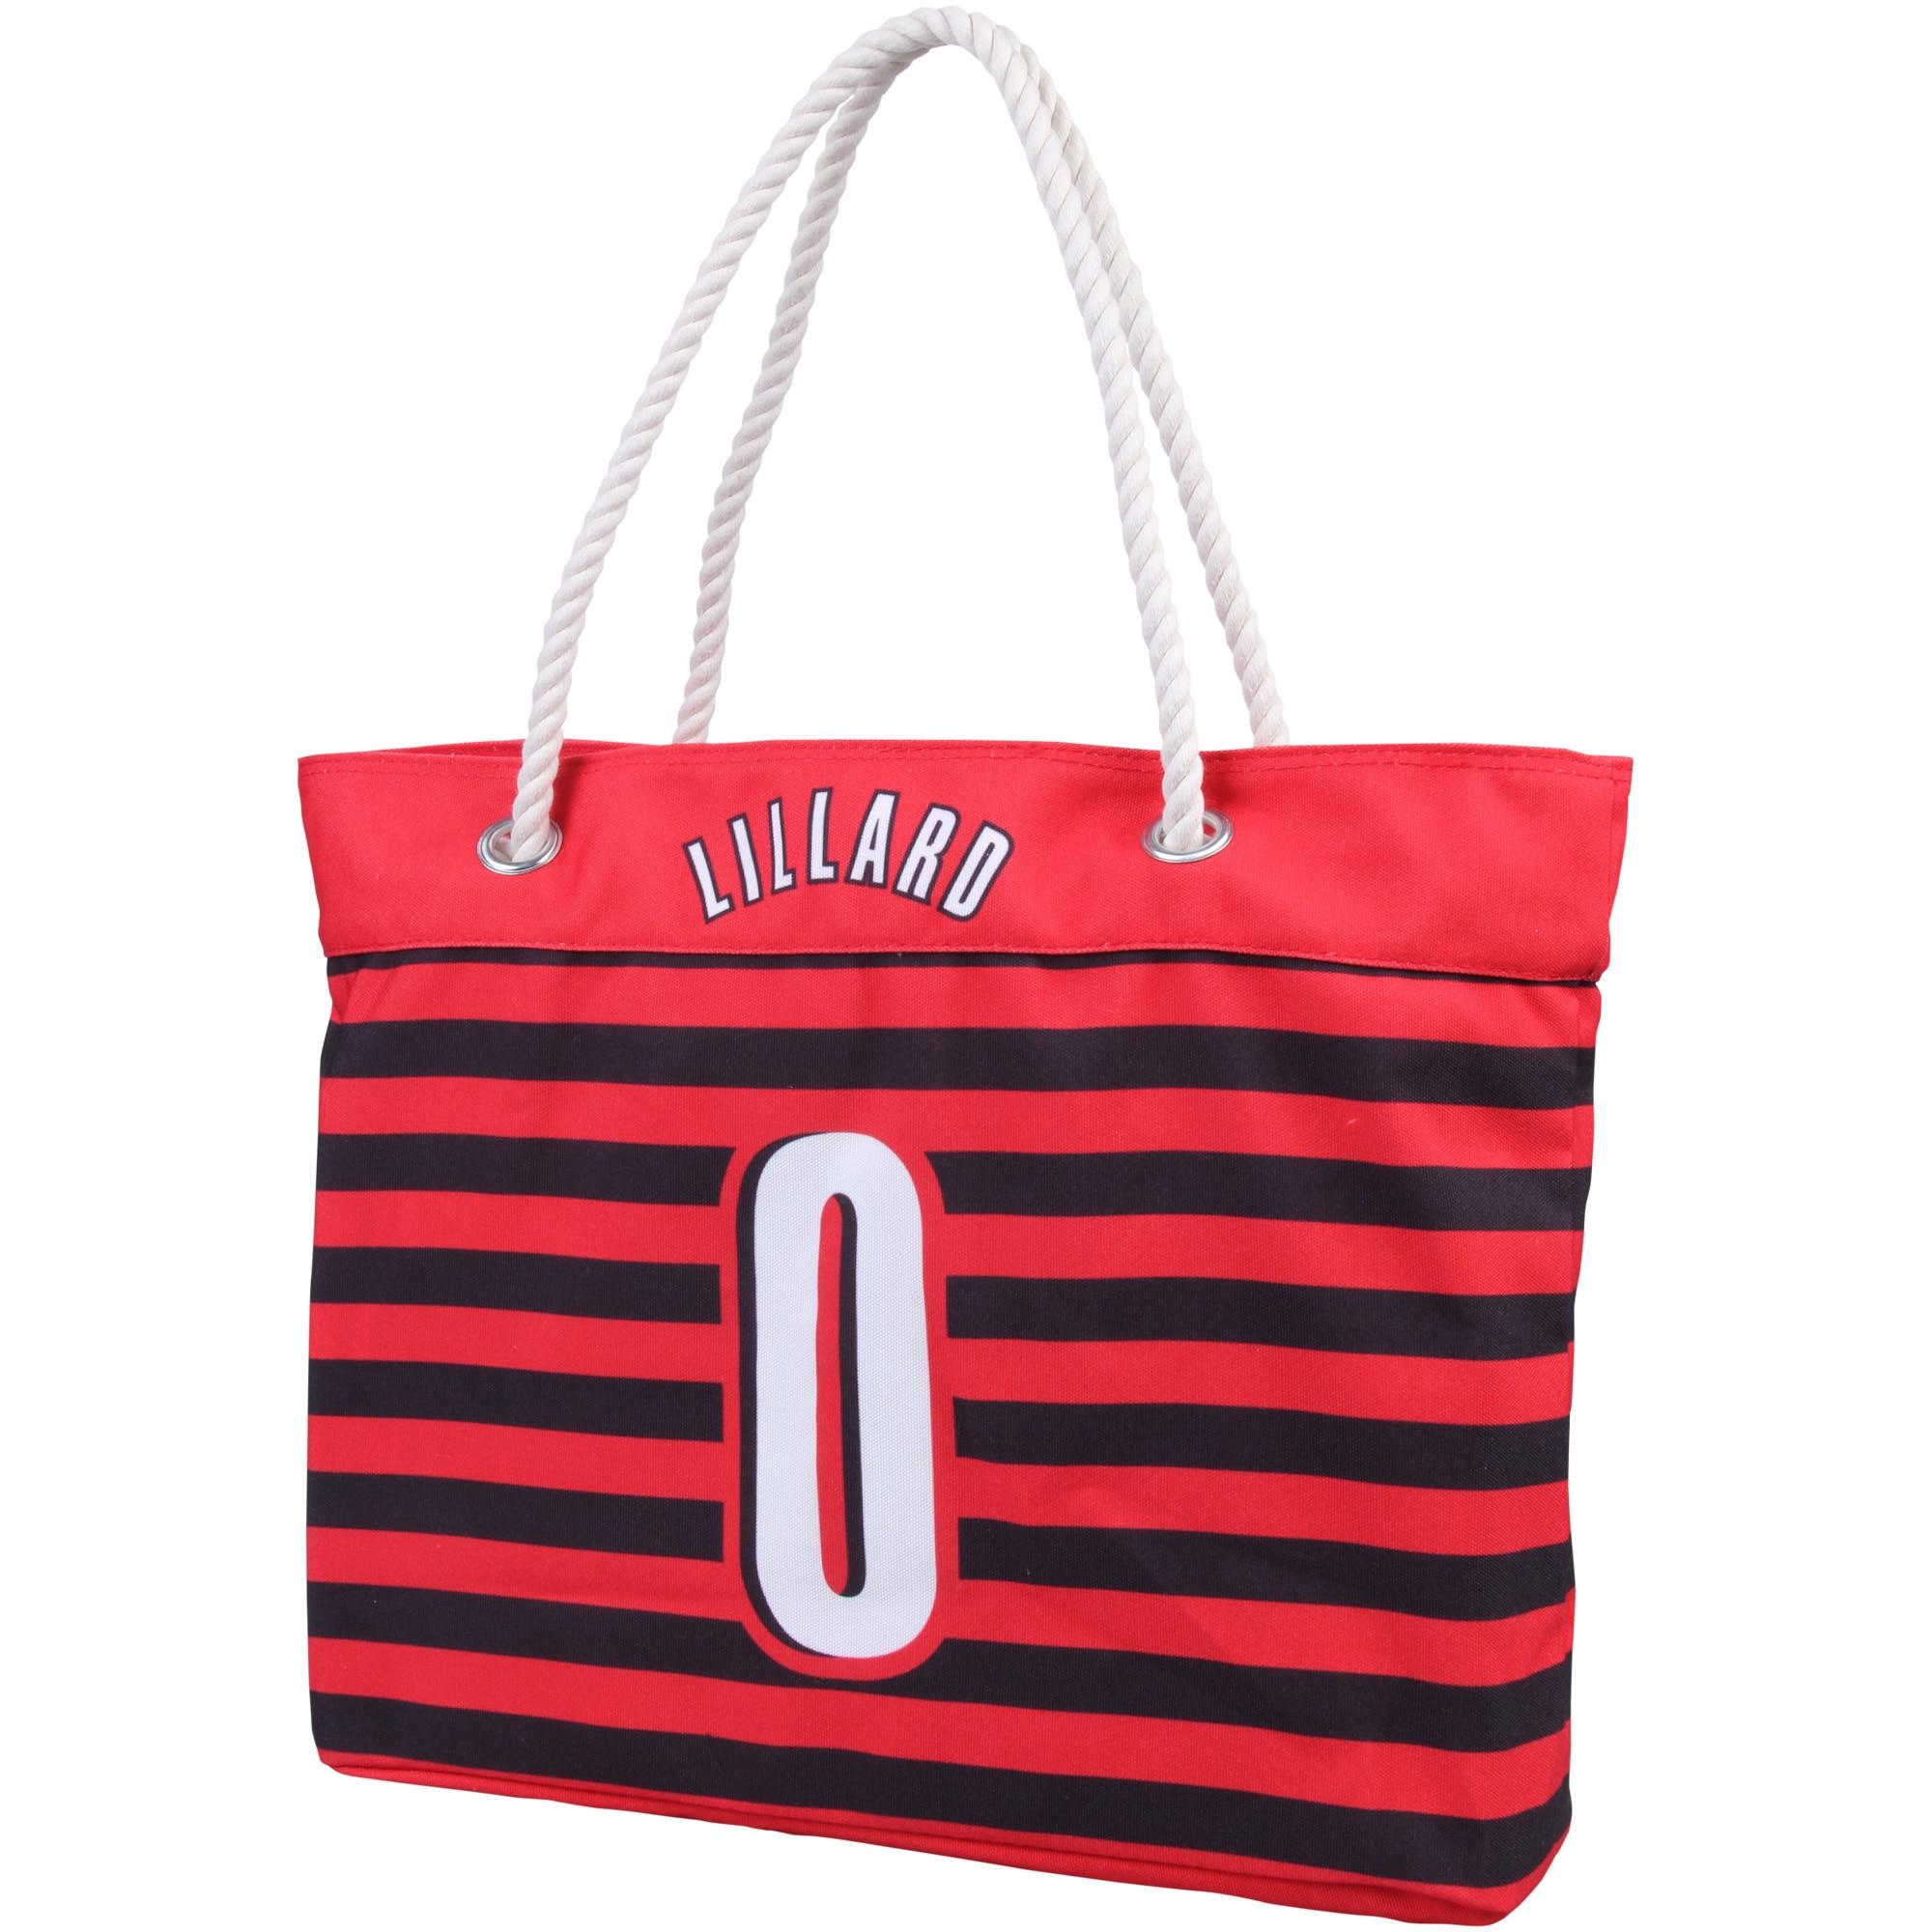 Damian Lillard Portland Trail Blazers Women's Player Nautical Stripe Tote Bag - Red